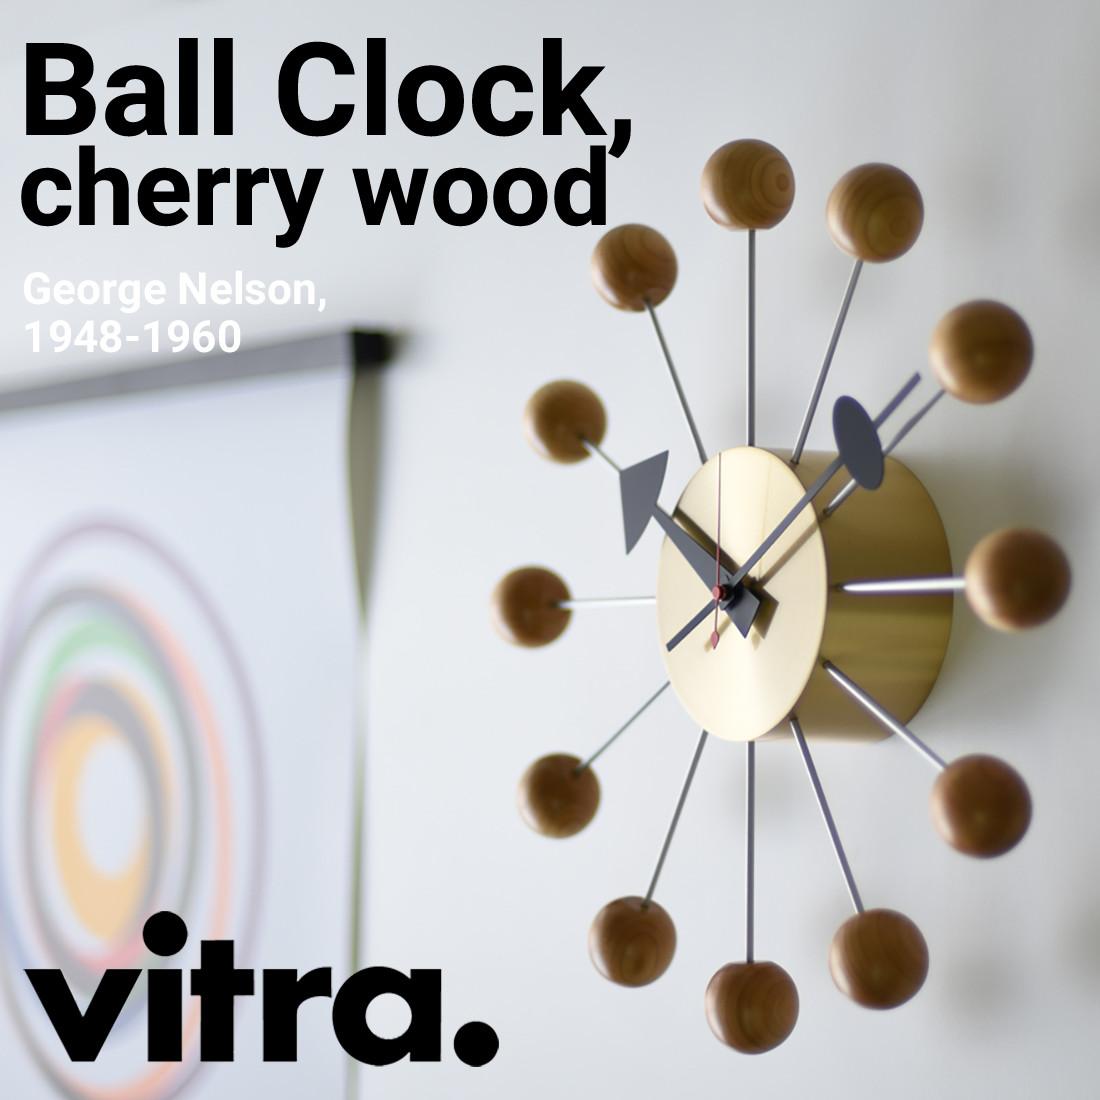 【Vitra】Ball Clock Cherry wood 高品質クオーツ時計式ムーブメン トボールクロック/チェリー/ウッド/ヴィトラ/掛け時計/クロック/木製/ジョージ・ネルソン/George Nelson